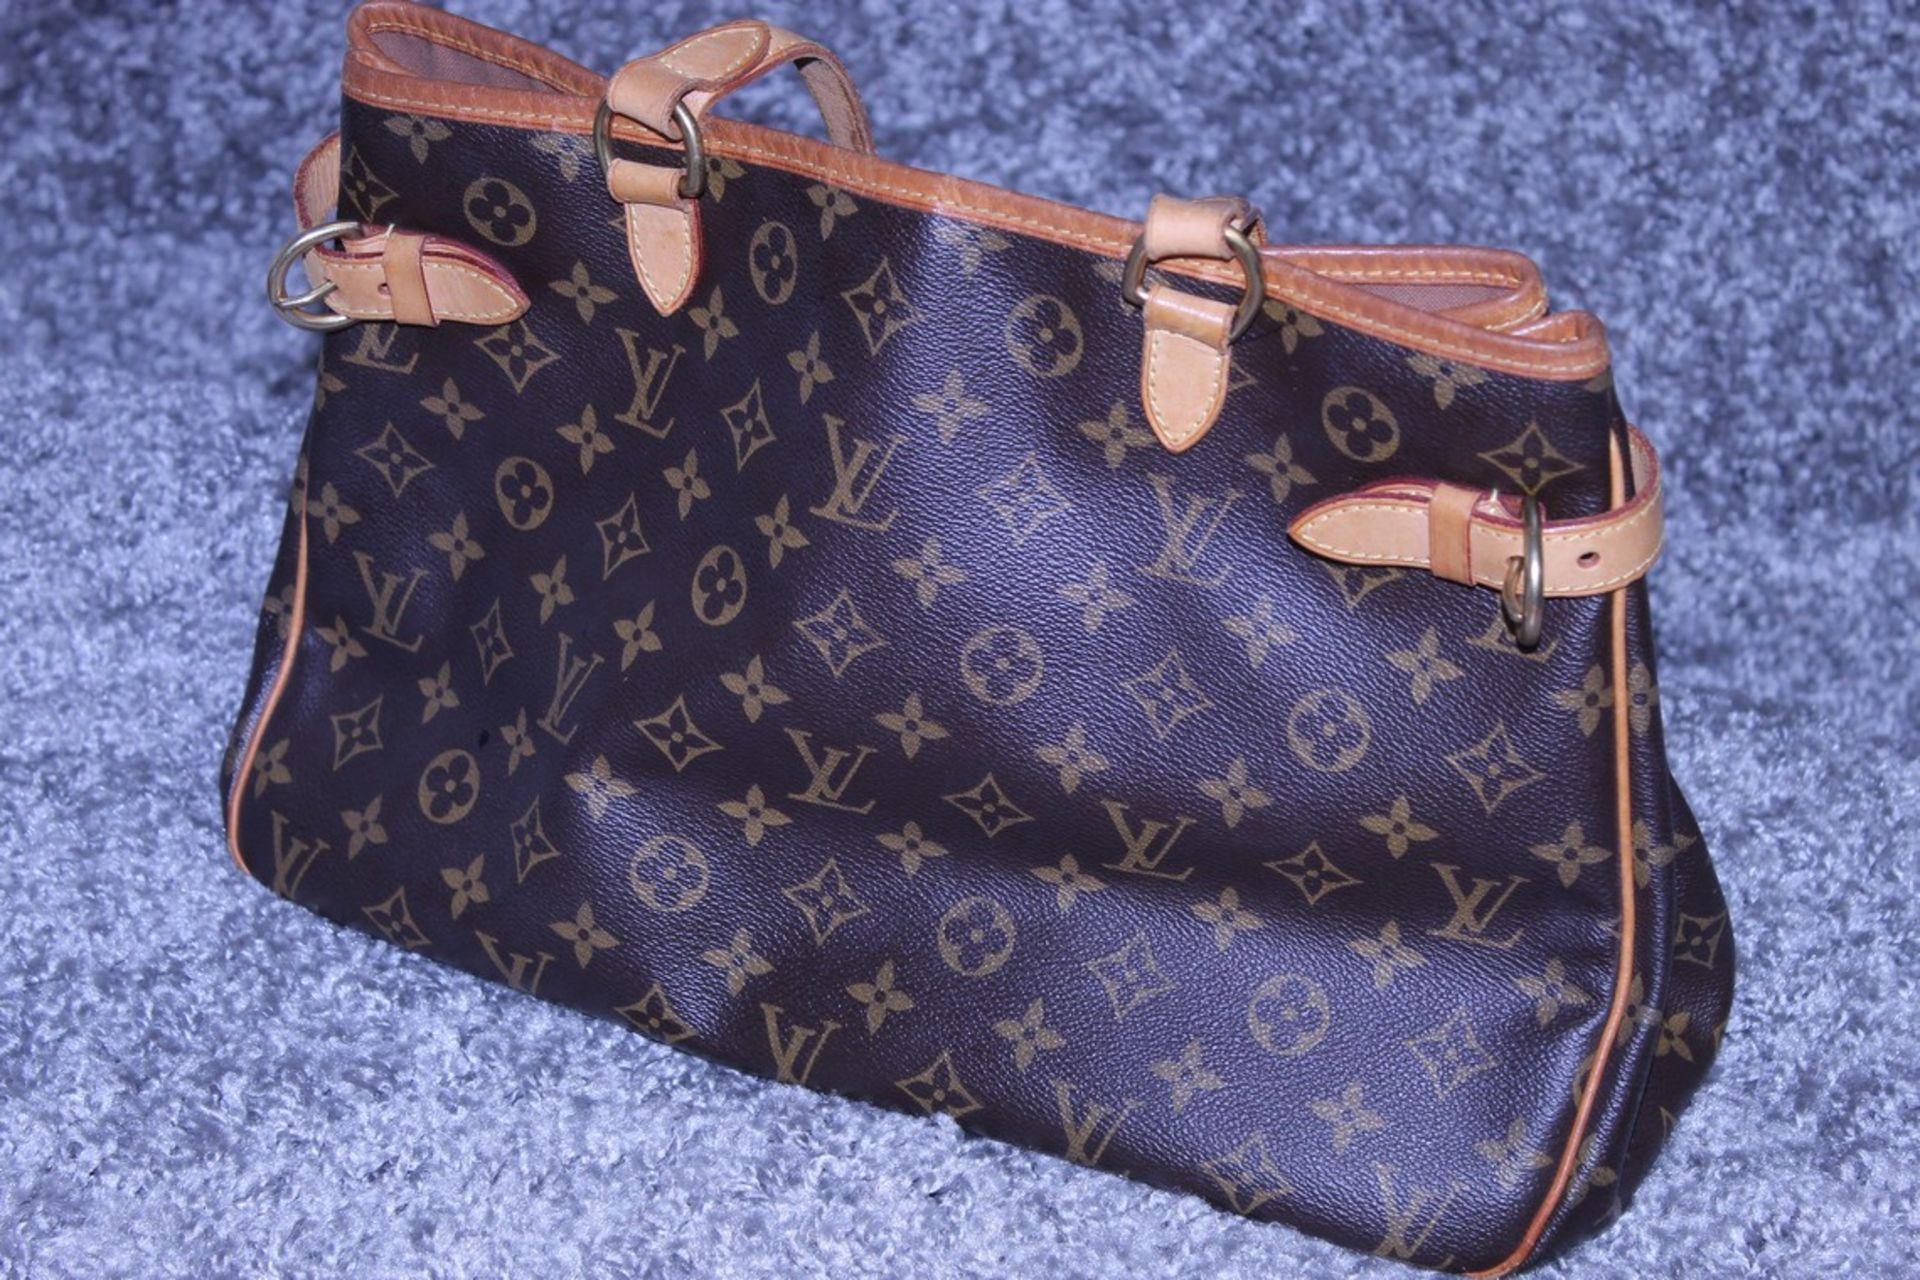 RRP £1,200 Louis Vuitton Batignolles Horizontal Shoulder Bag, Brown Monogram Canvas, Vachetta - Image 3 of 4